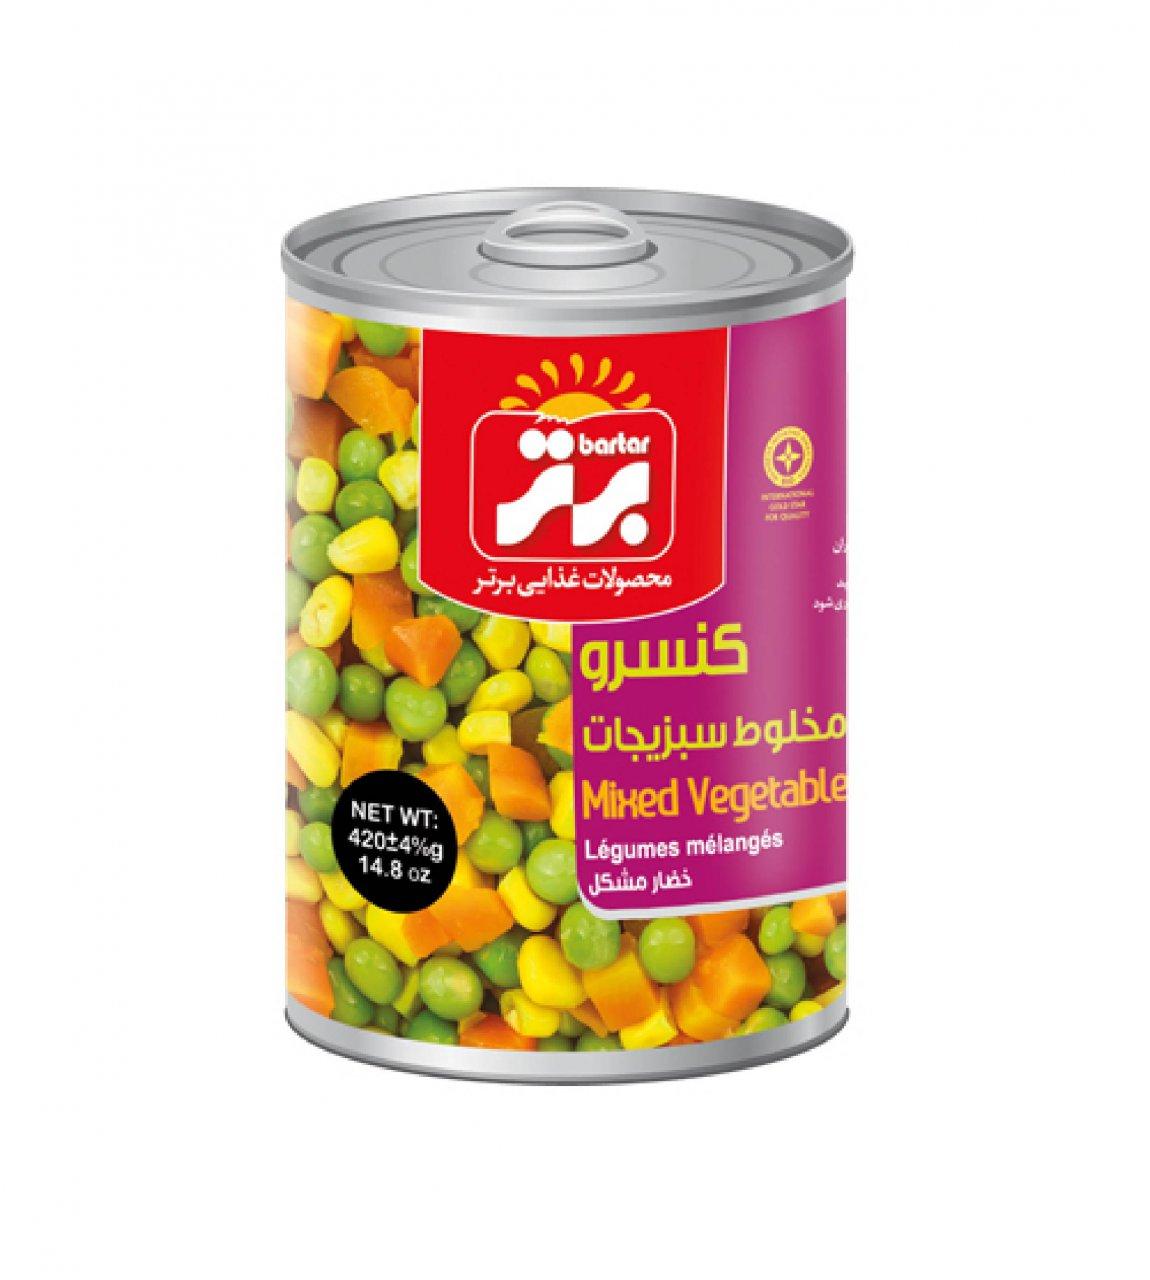 کنسرو مخلوط سبزیجات 420 گرم برتر